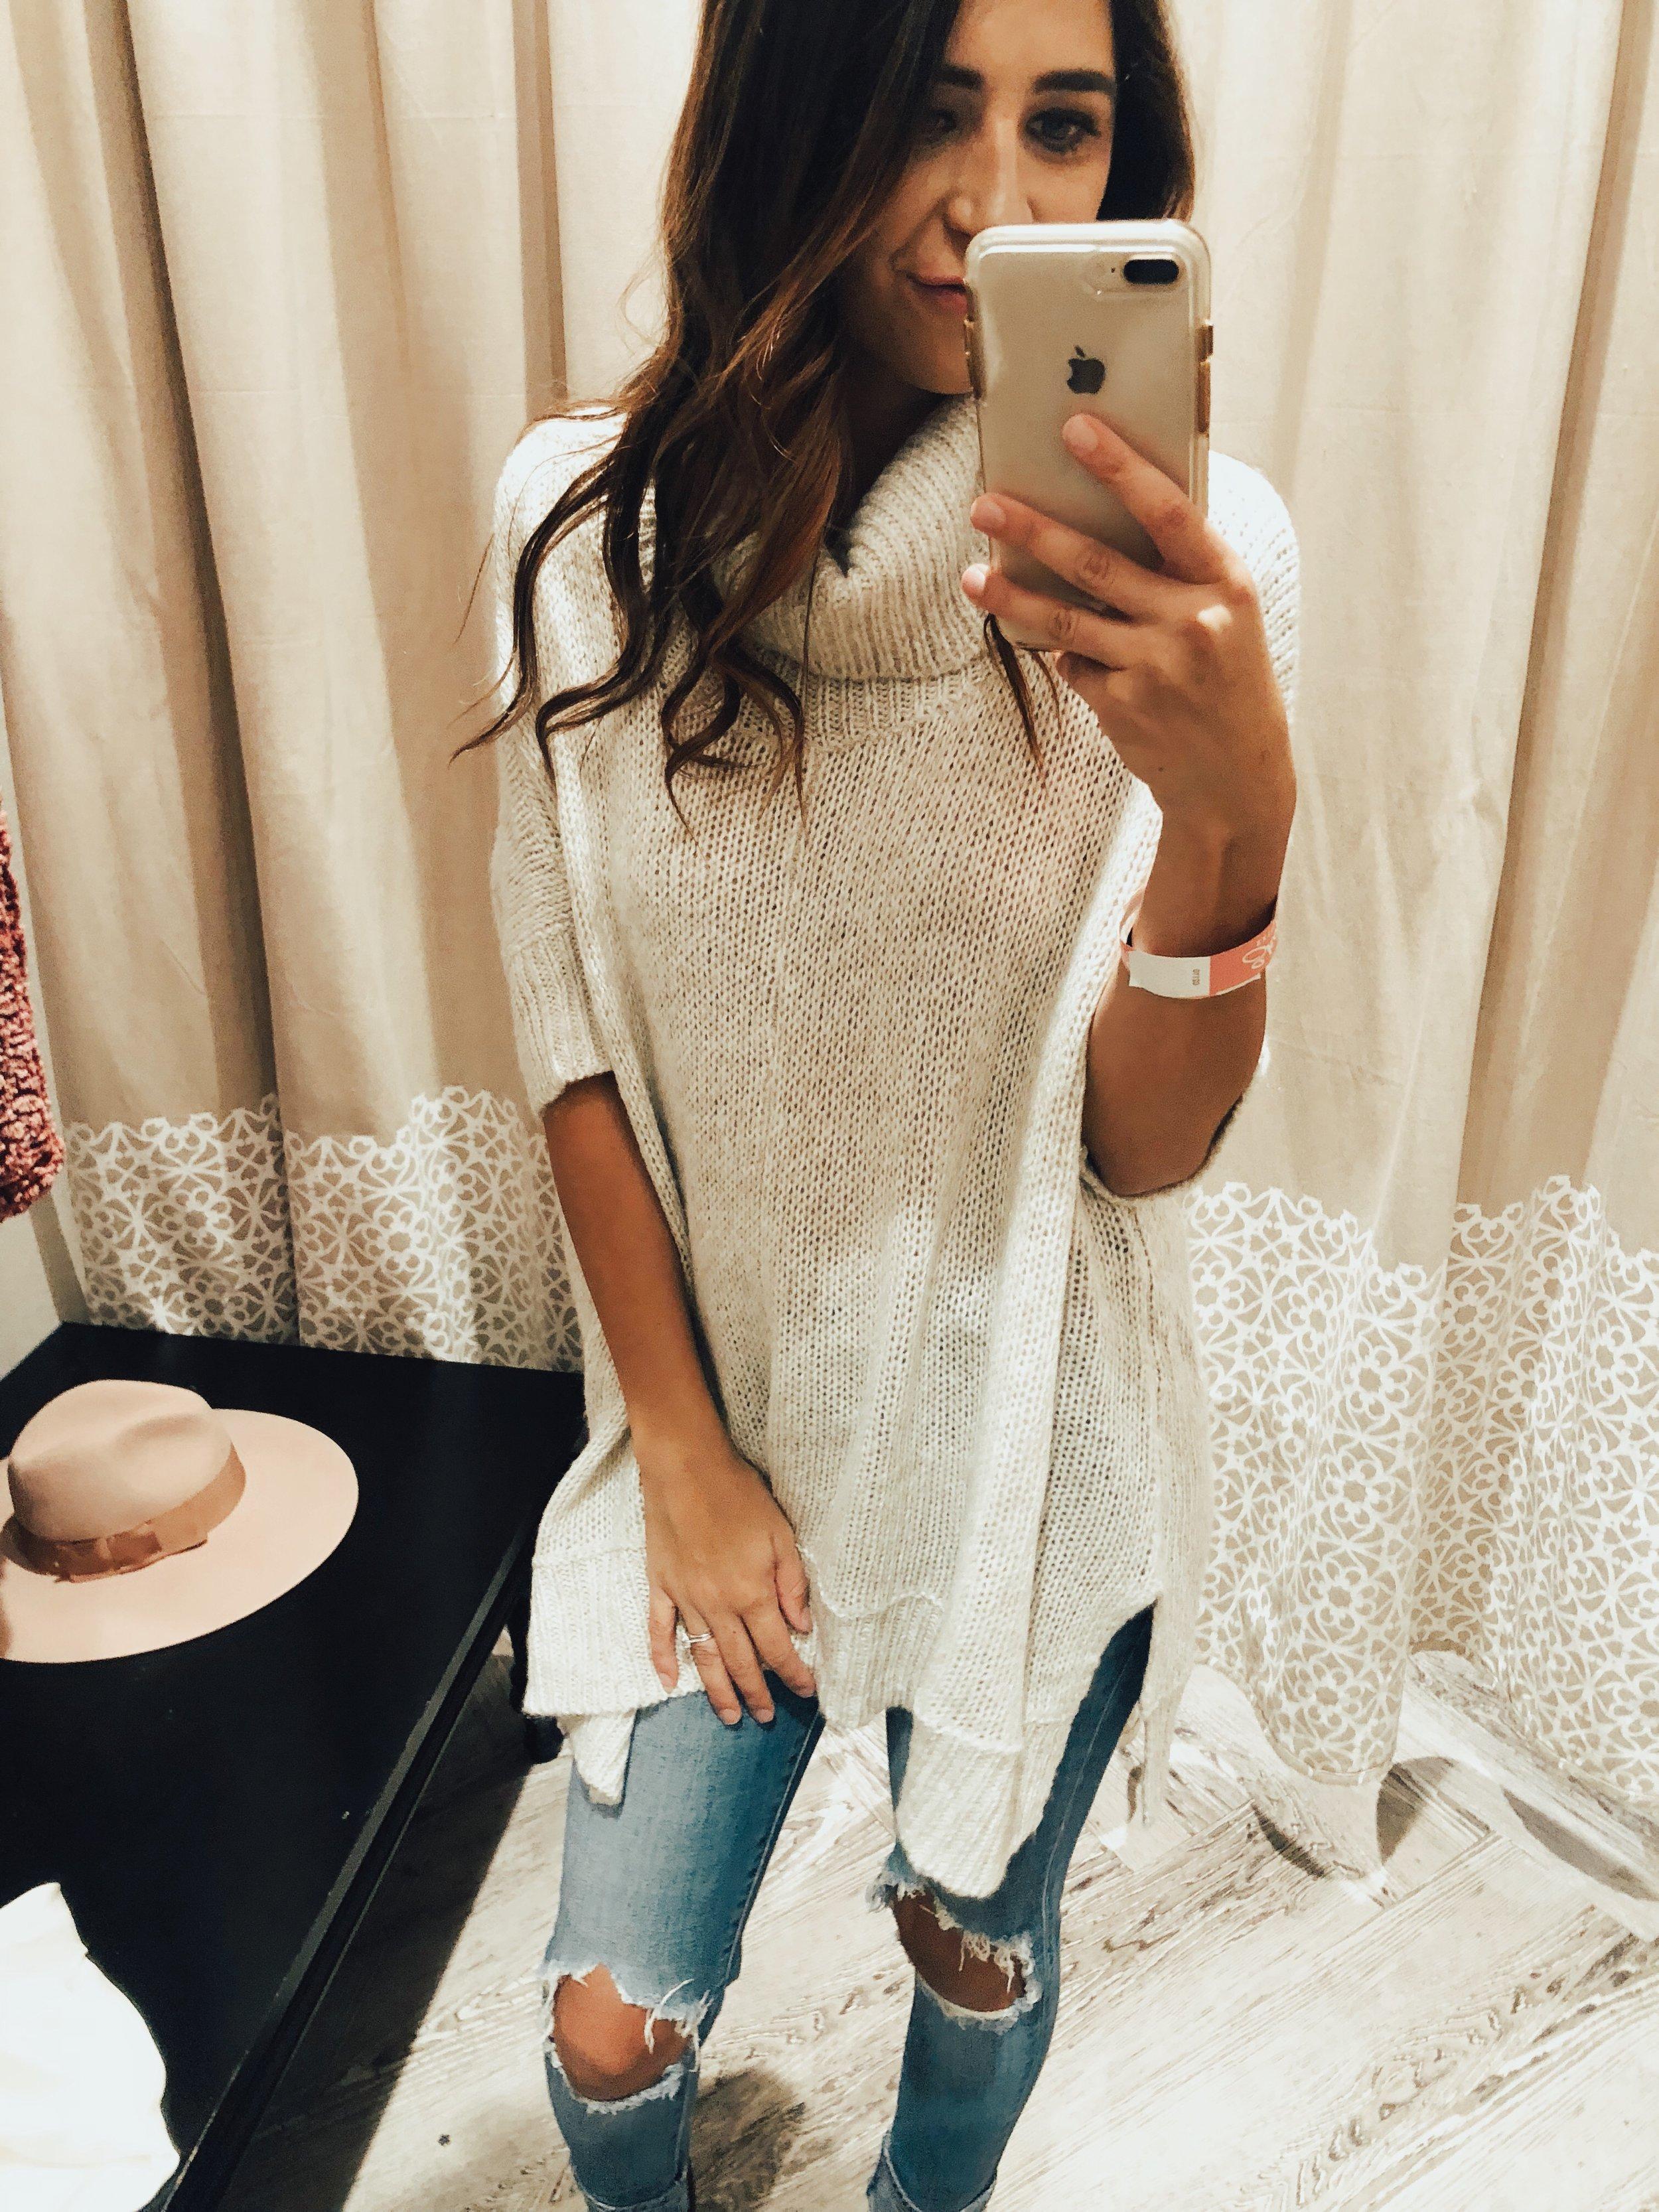 wearing small/medium